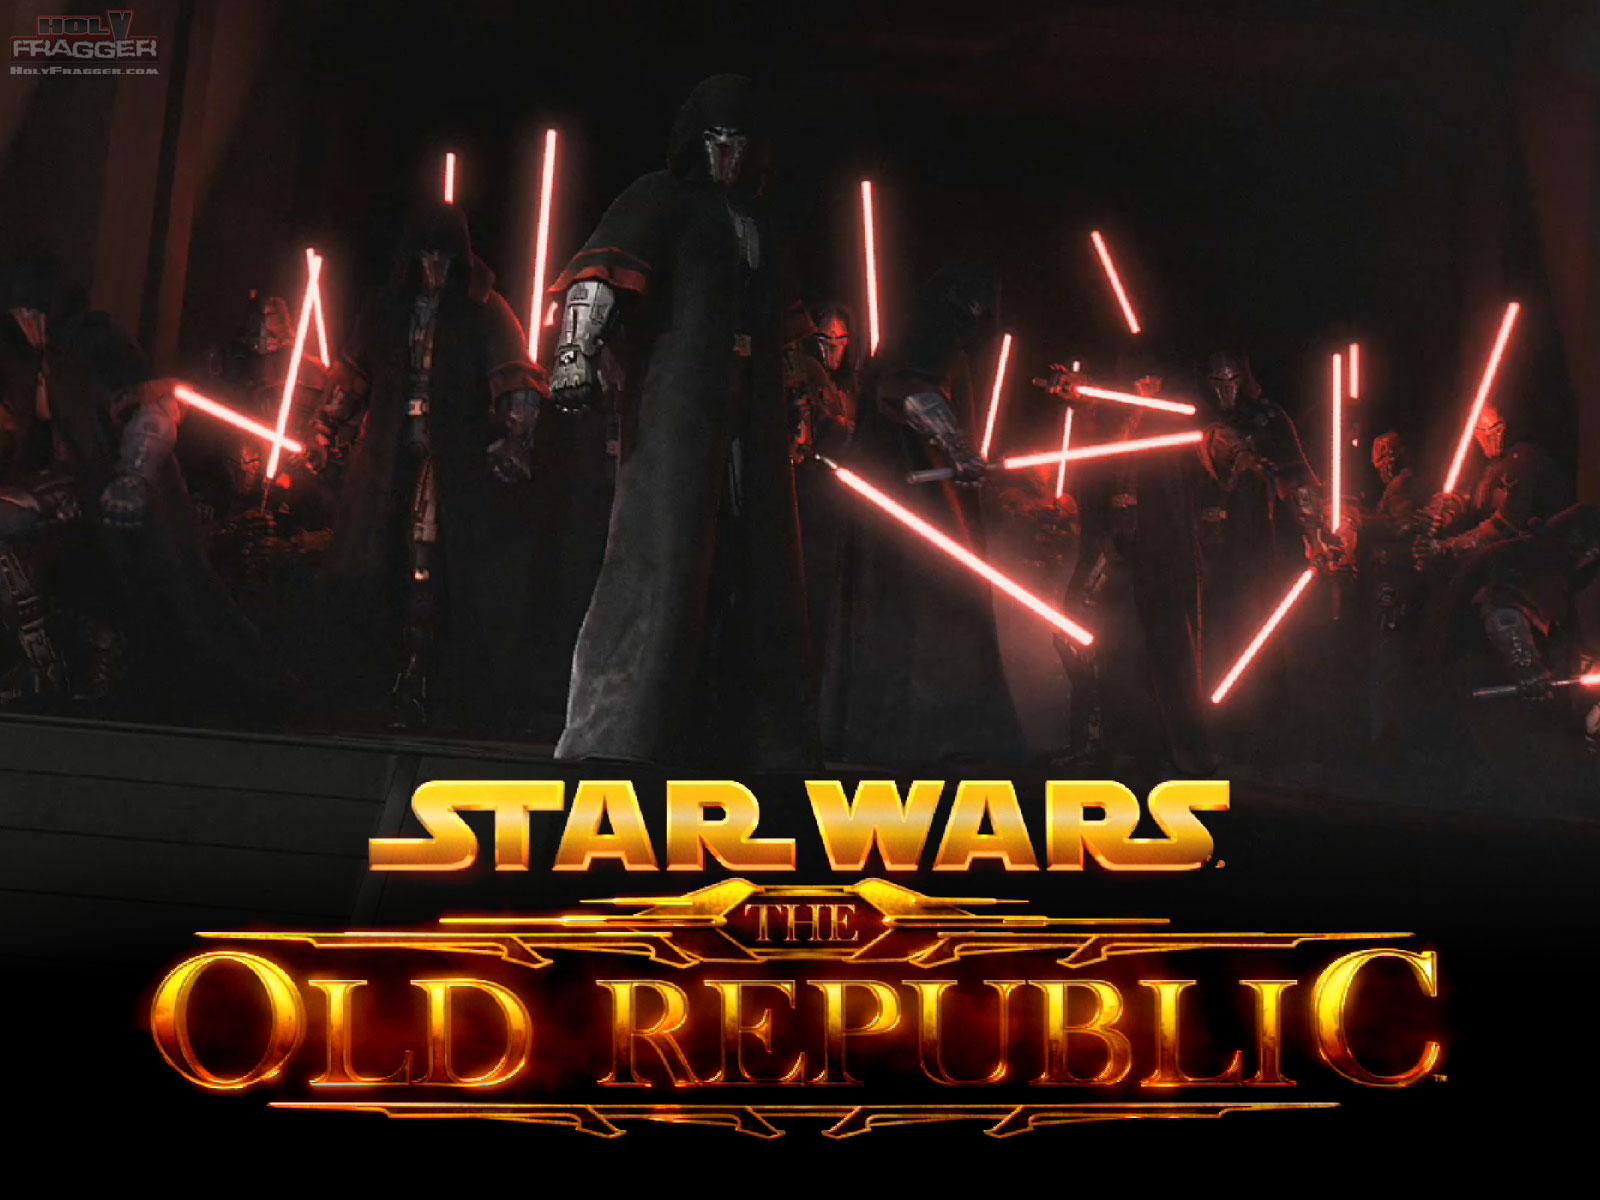 Star Wars Old Republic Wallpaper: New-blog-pics: The Old Republic Wallpaper 1920x1080